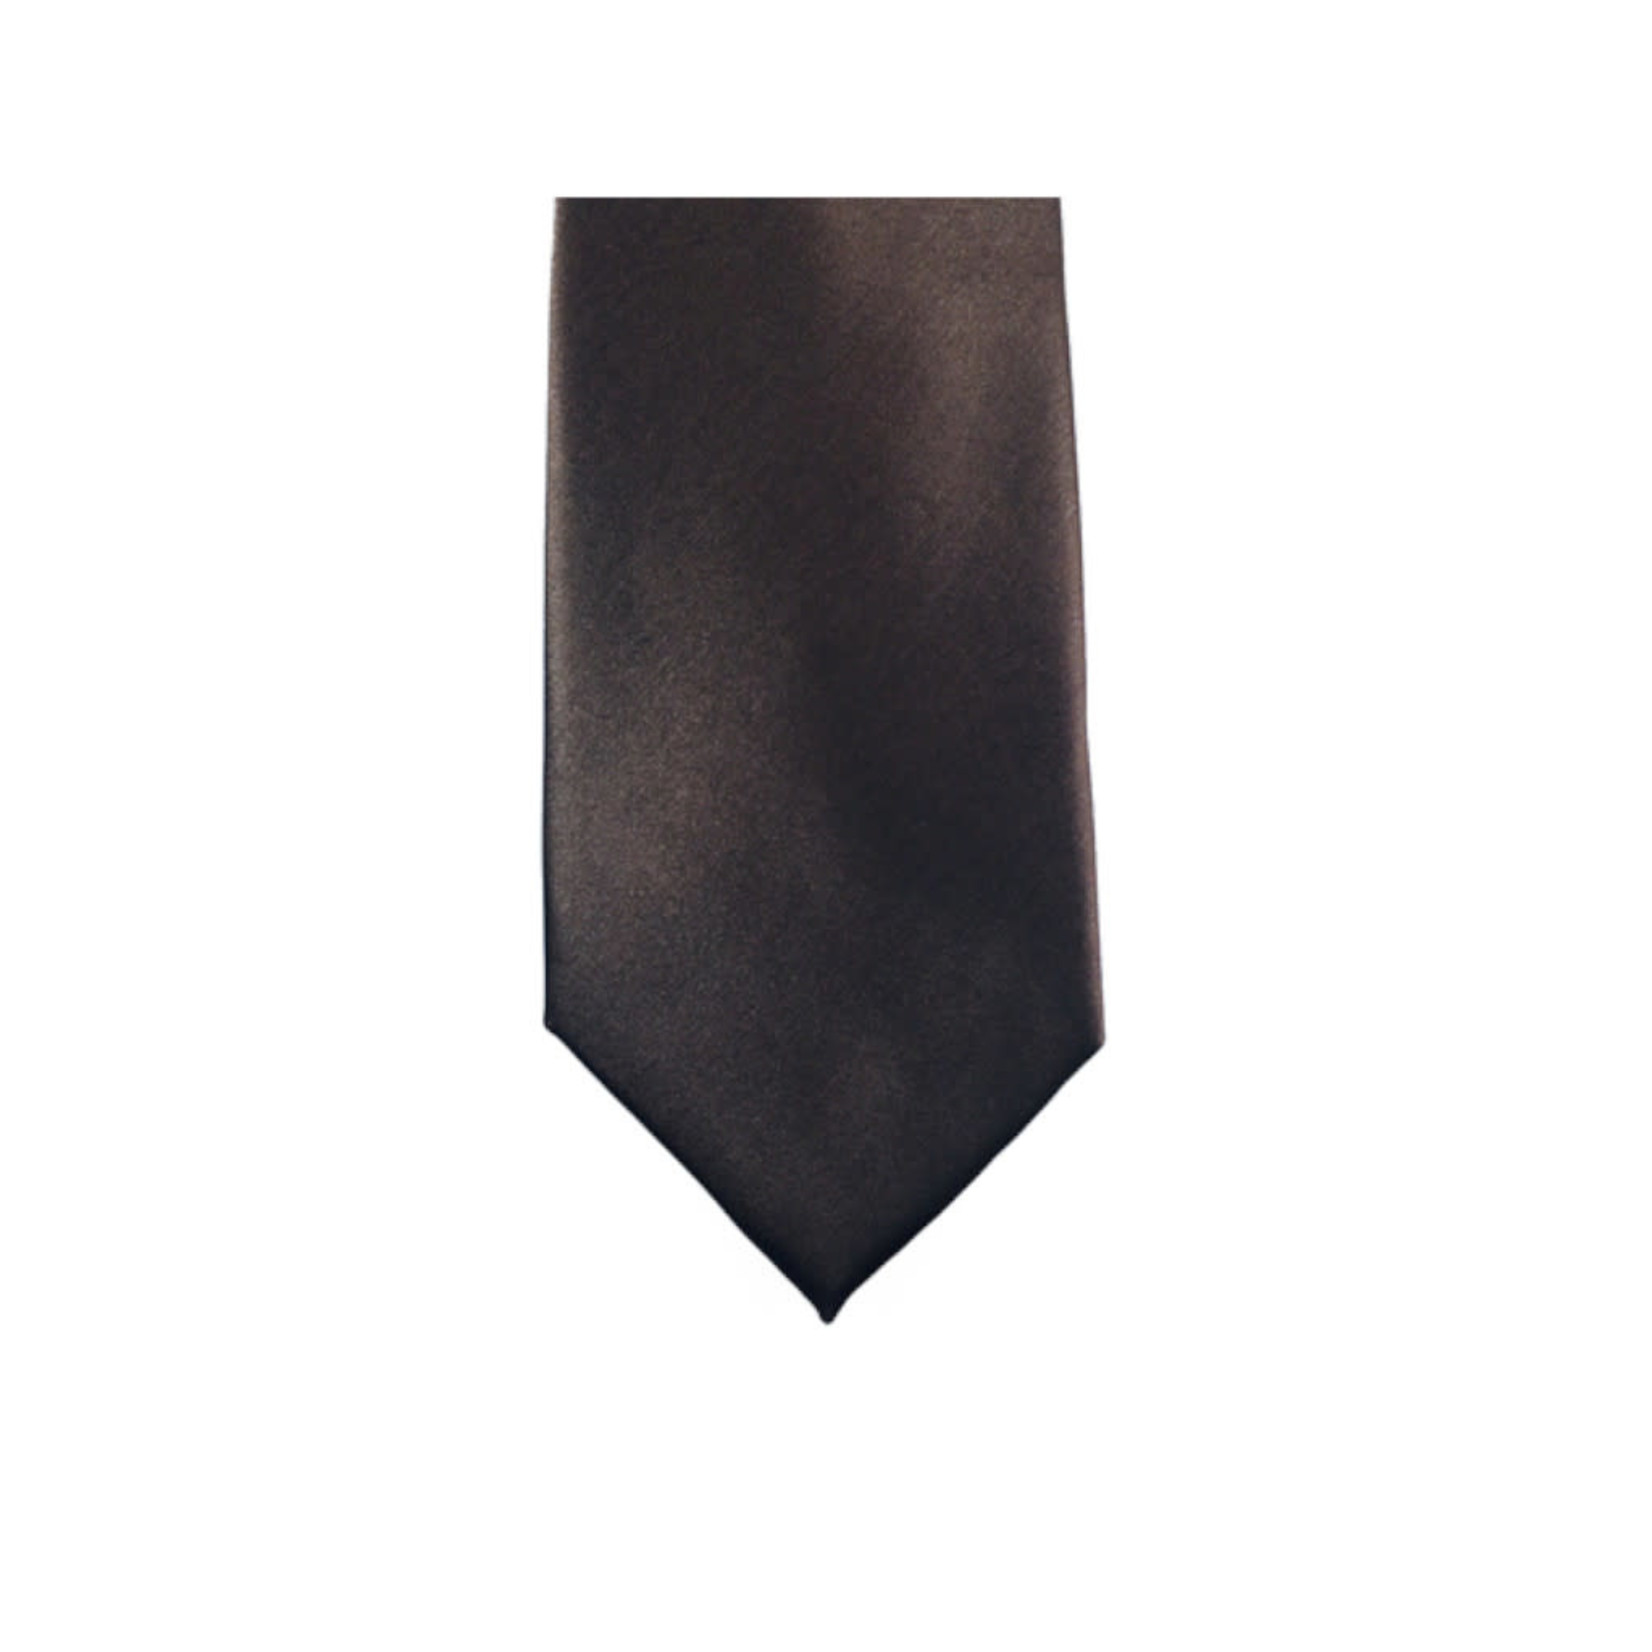 Knotz M100-21 Solid Brown Tie